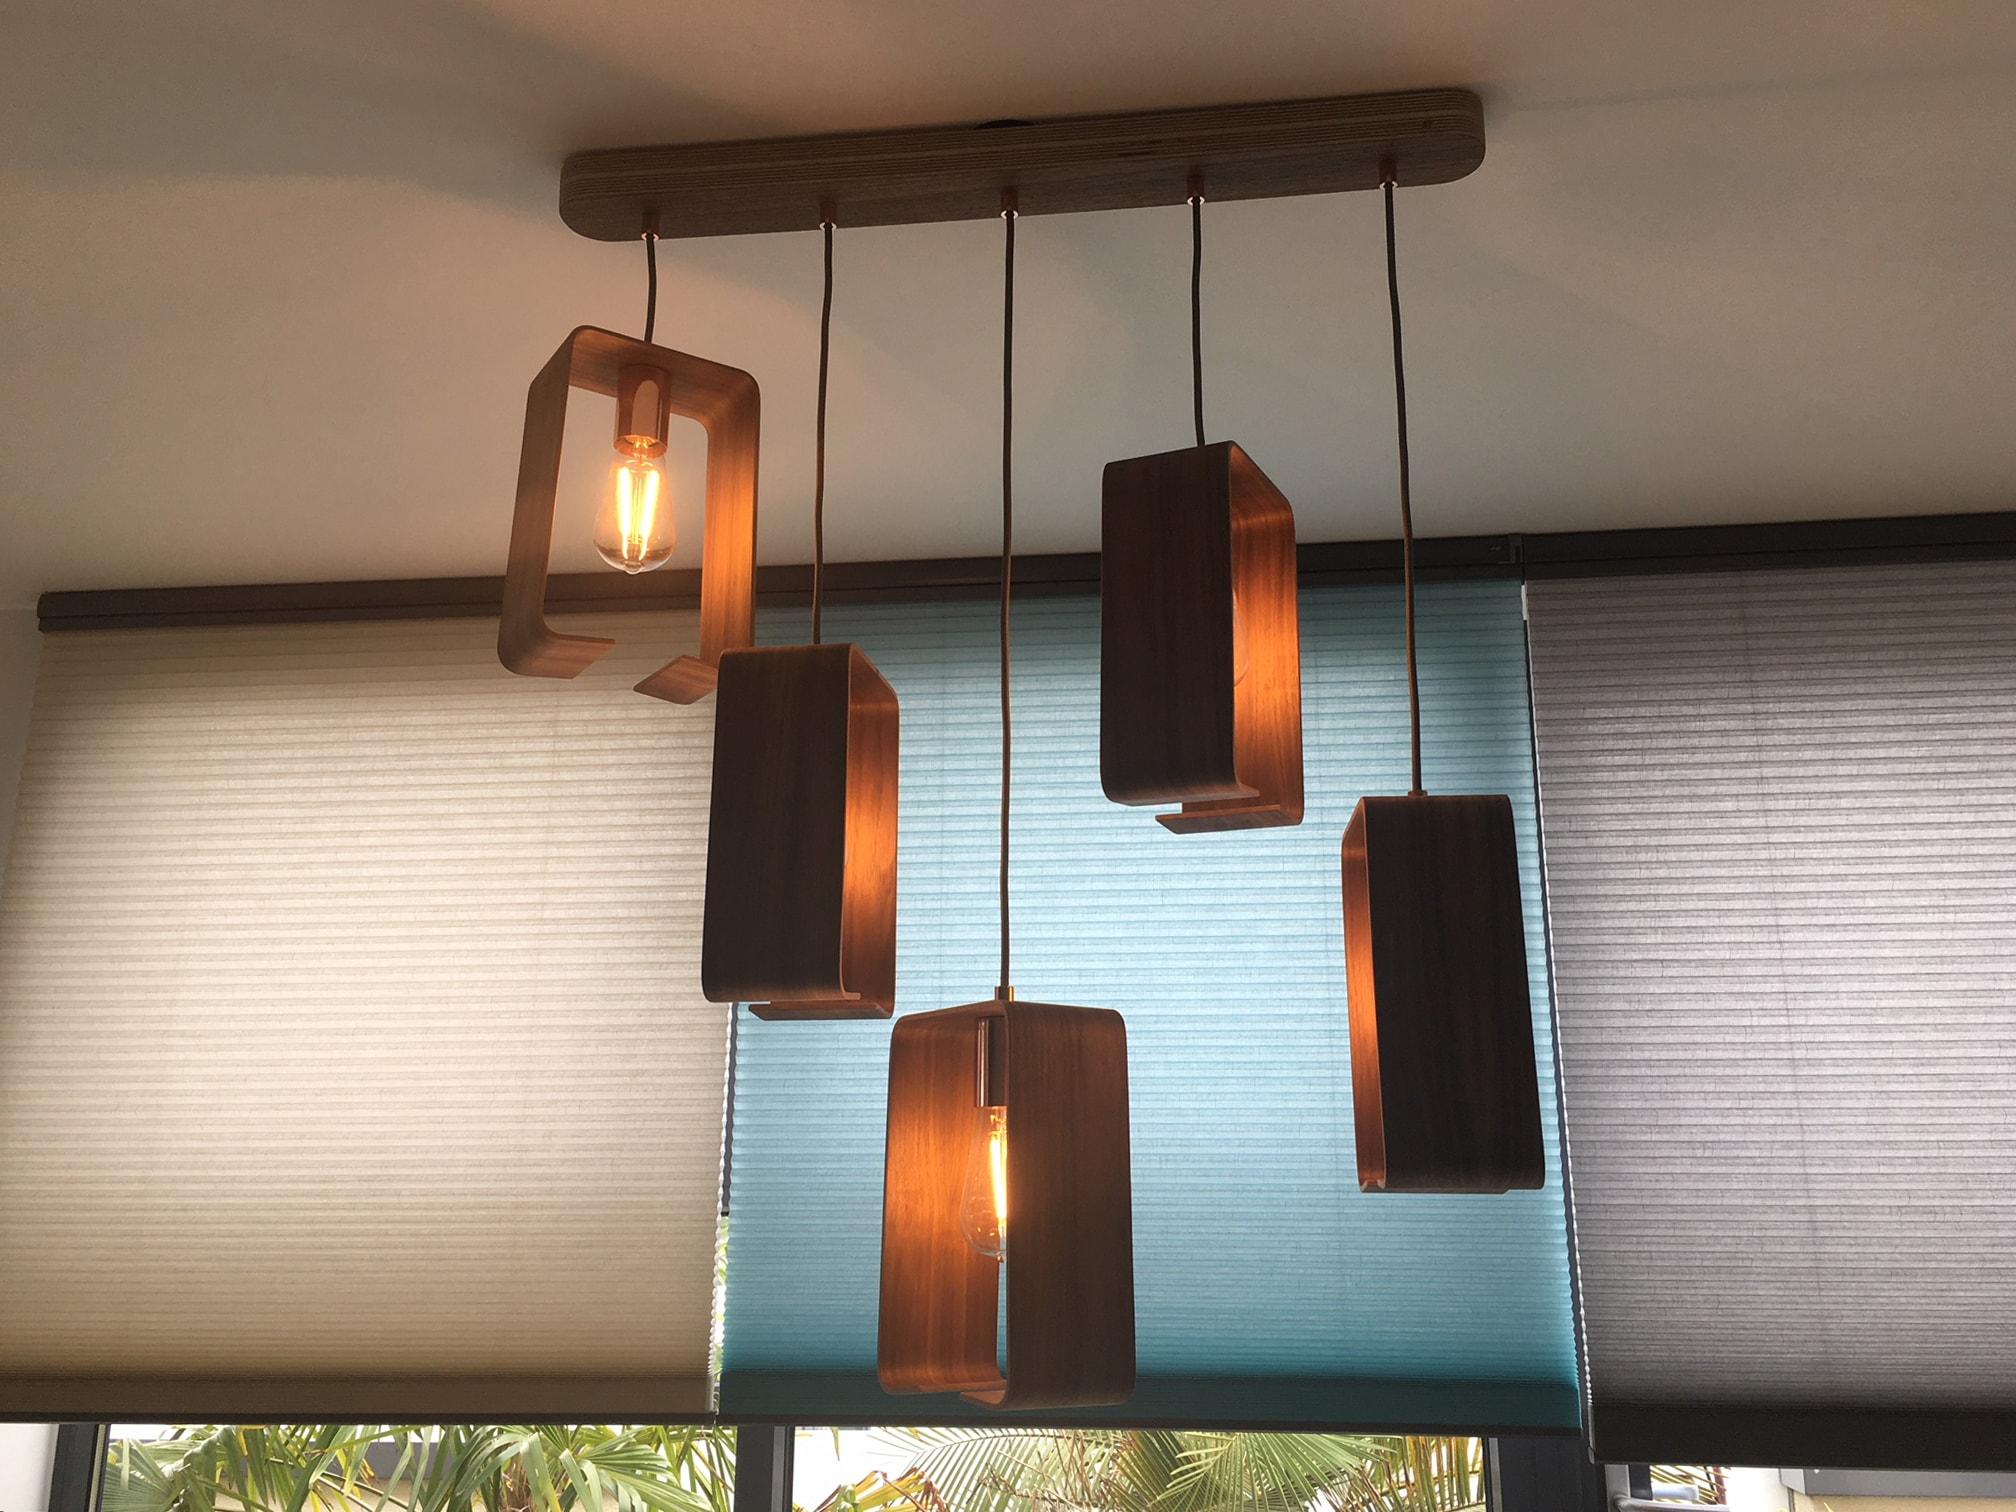 Order 337 - Fab Lamps 2-min.jpg